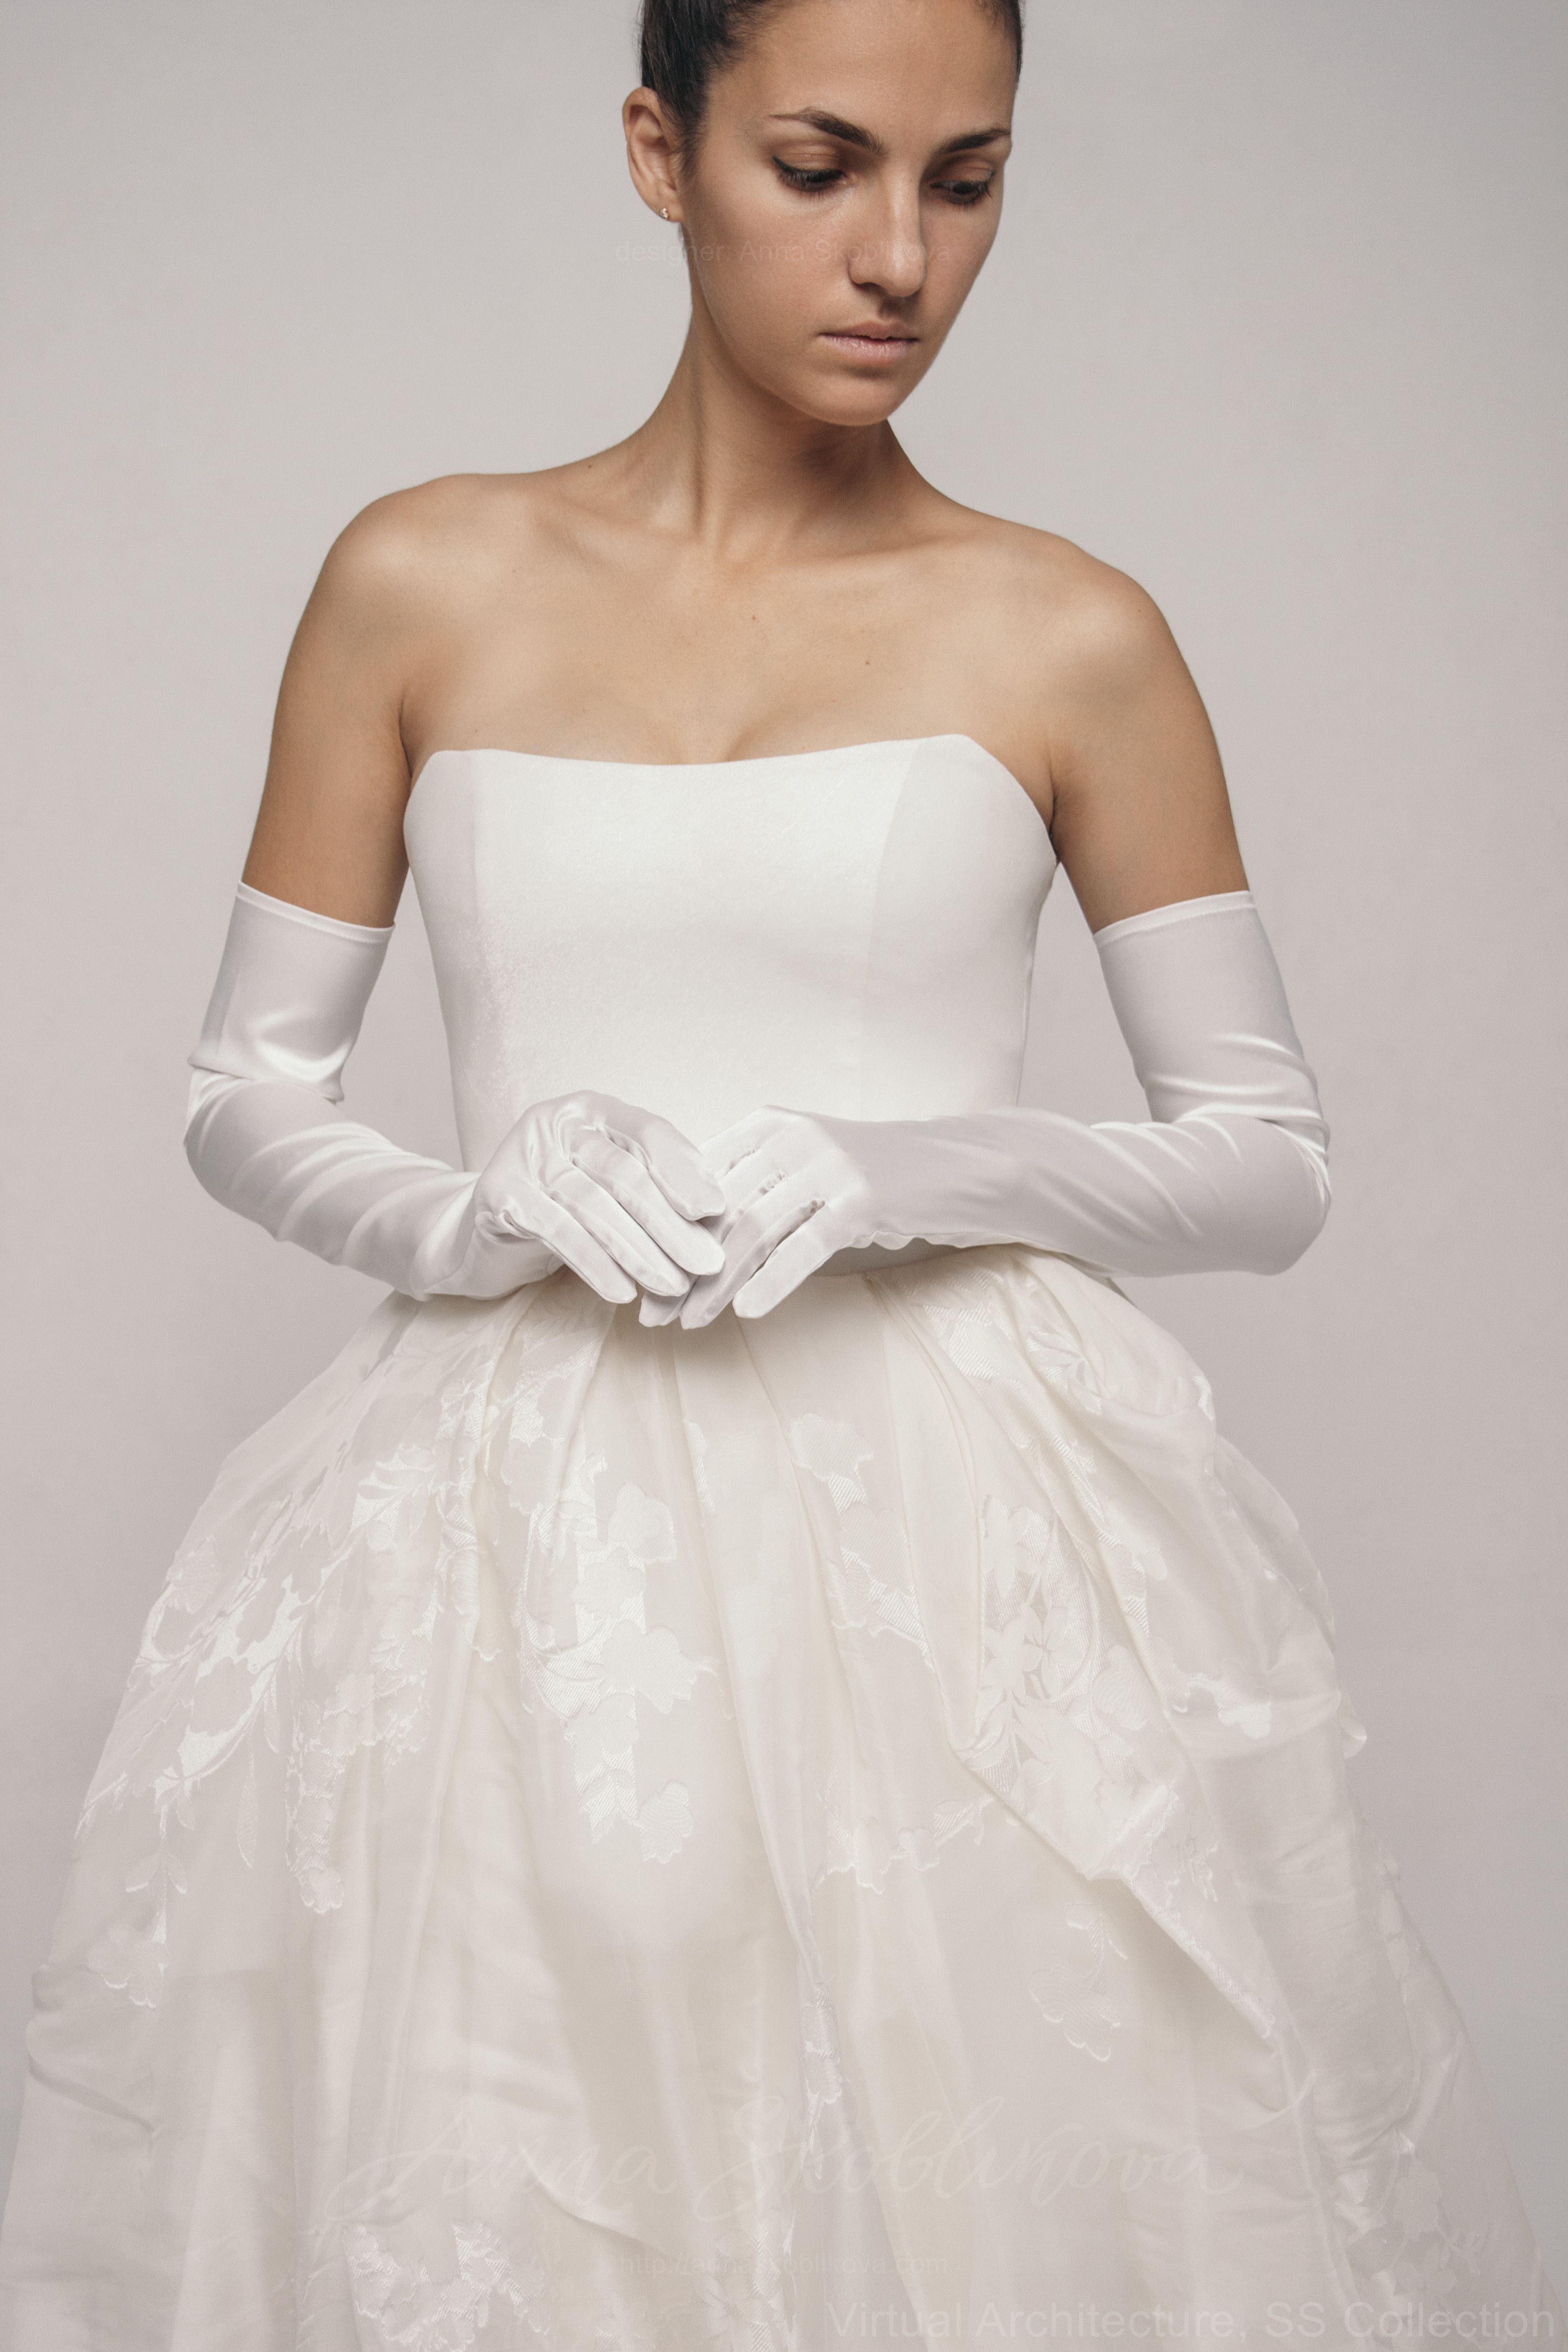 Свадебное платье из органзы - Plantier  Anna Skoblikova | Photo 1